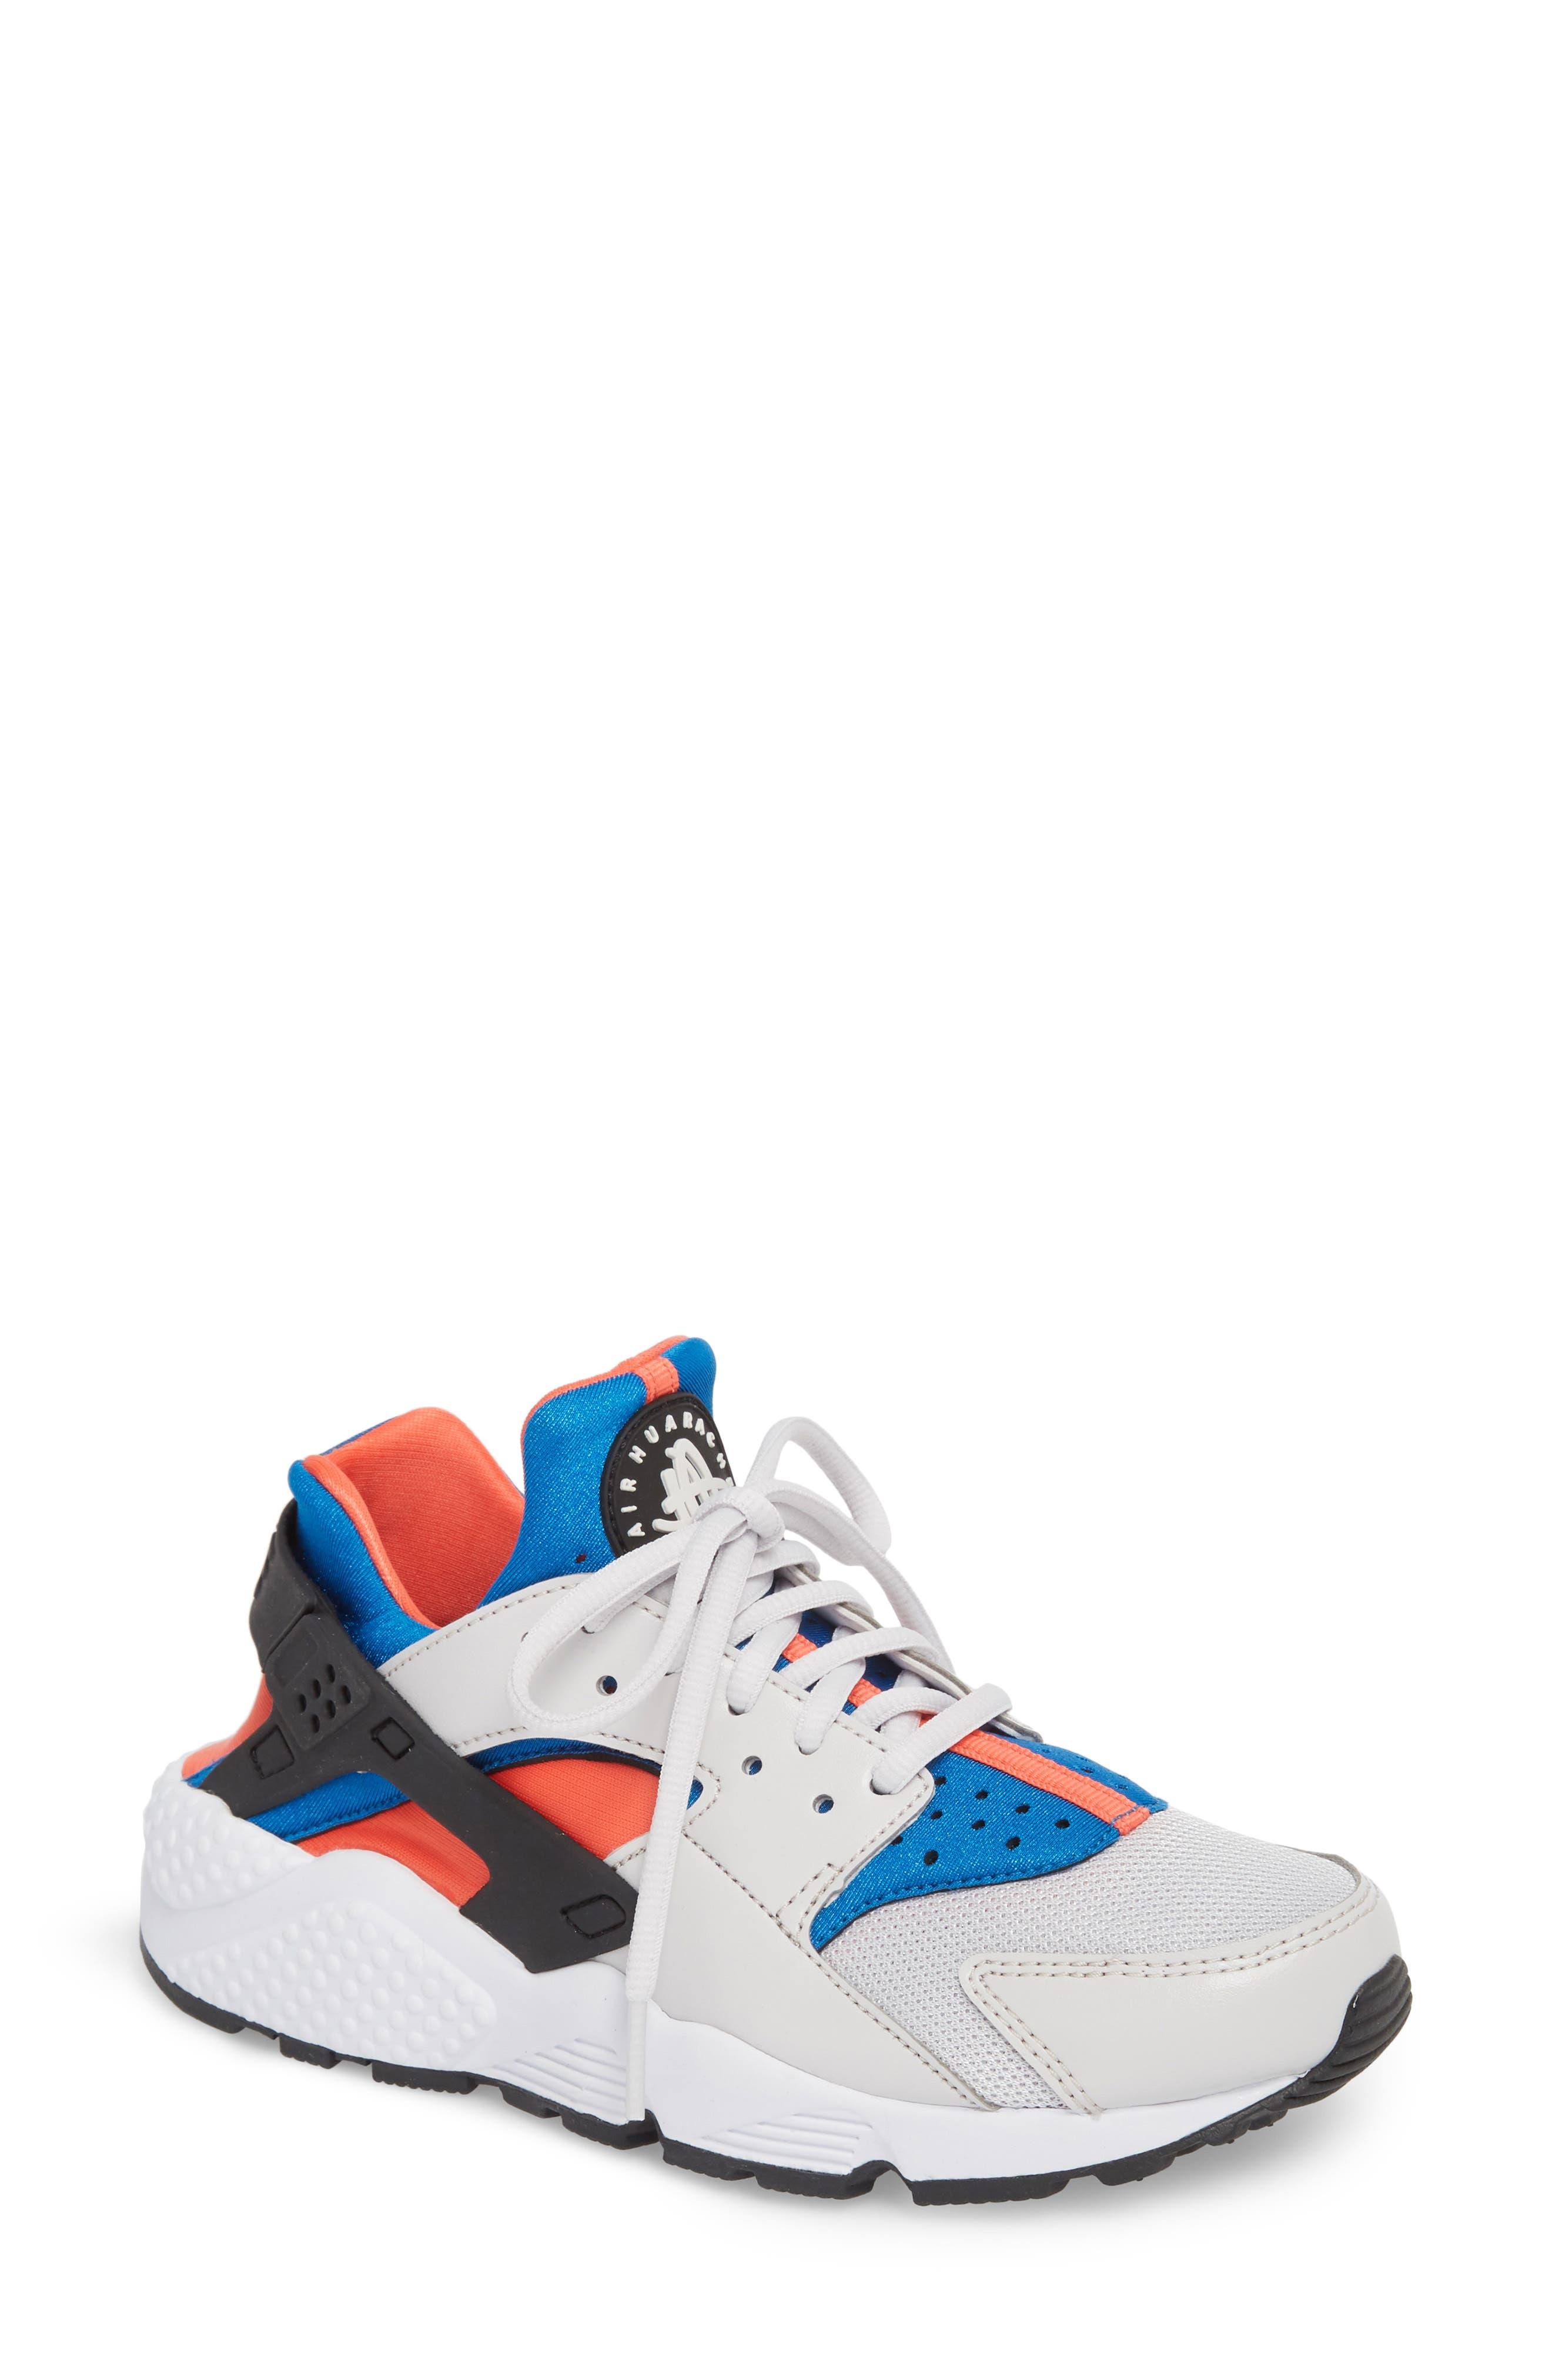 Air Huarache Run Sneaker,                         Main,                         color, Grey/ Black/ Coral/ Nebula